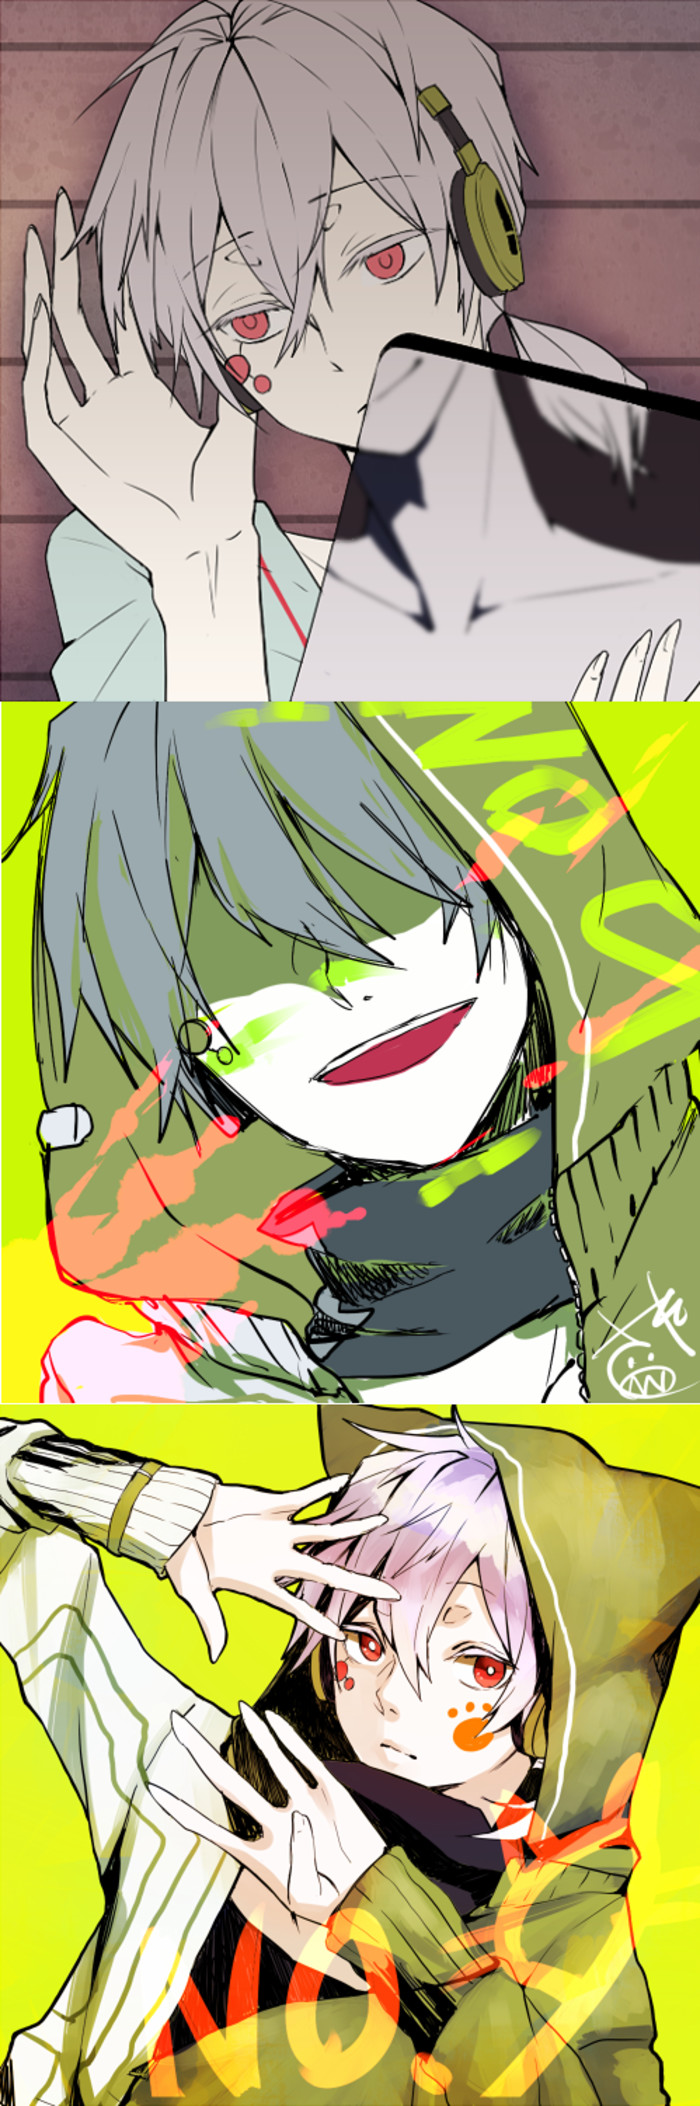 P站 Pixiv カゲ 来自檀濯的图片分享 堆糖 Anime Kagerou Project Anime Boy